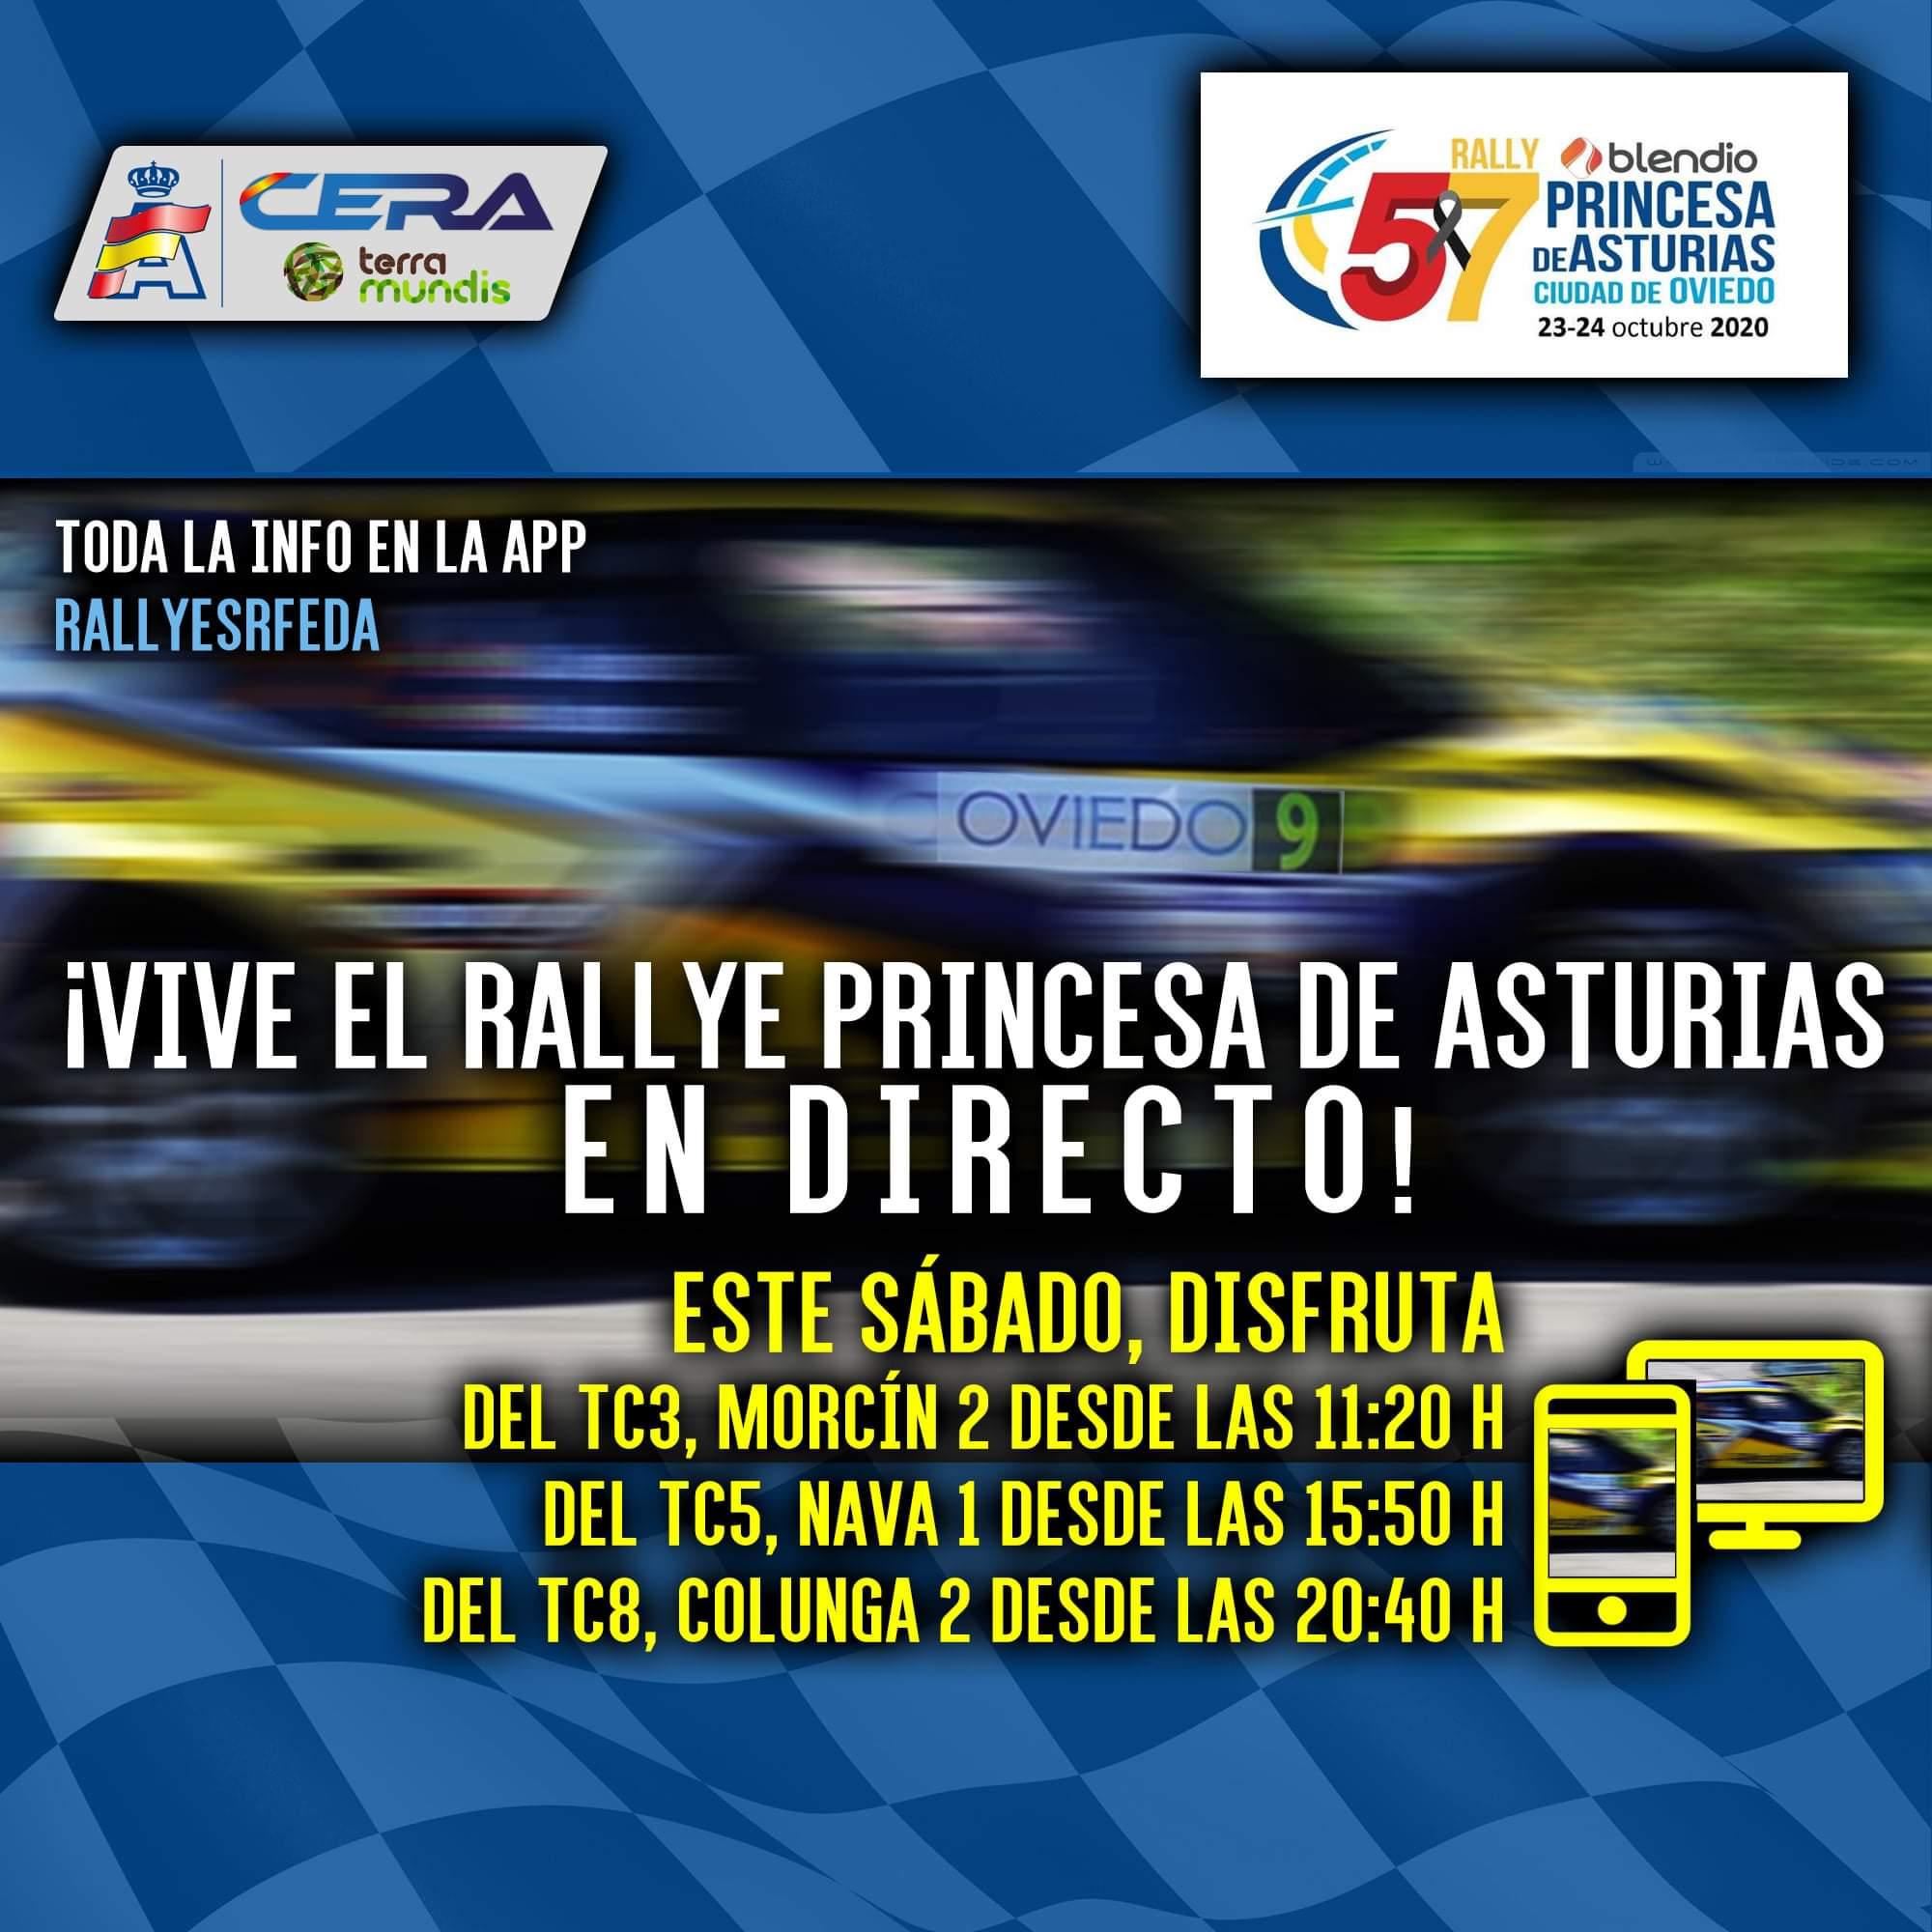 CERA + ERT: 57º Rallye Princesa de Asturias - Ciudad de Oviedo [23-24 Octubre] - Página 2 ElAiJBZXEAY1TTg?format=jpg&name=large